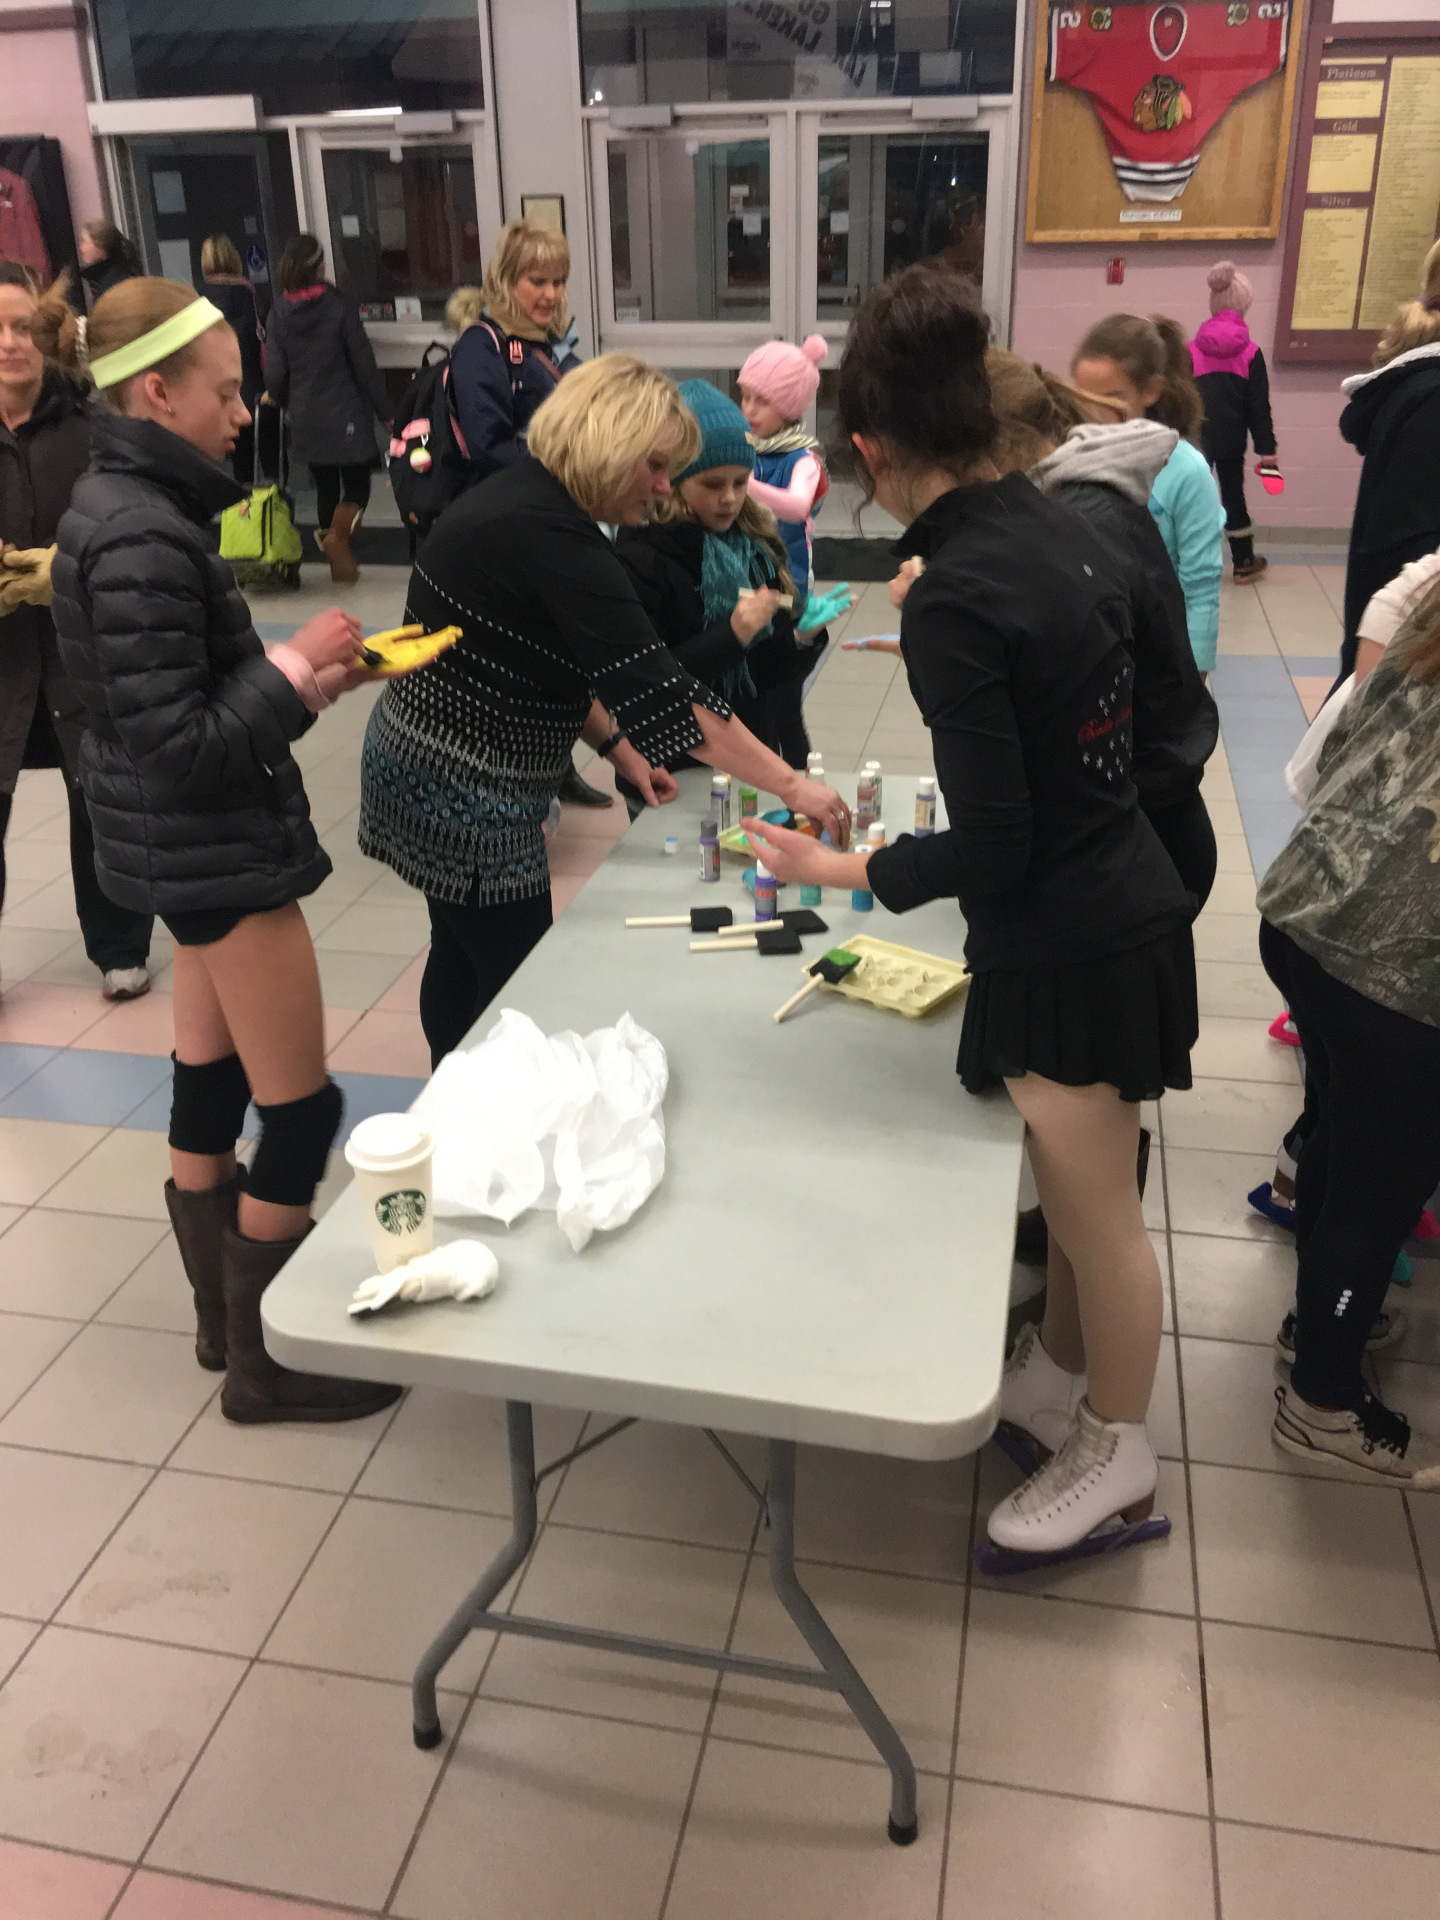 Club bonding - Making decorations for Regionals 2018